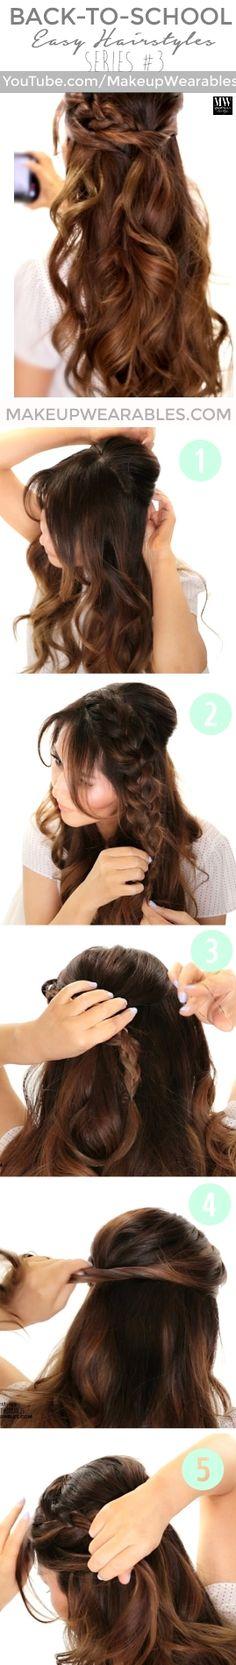 5 minute everyday braids hairstyles for school - half-up half-down: braided half-up half-down updo with curls